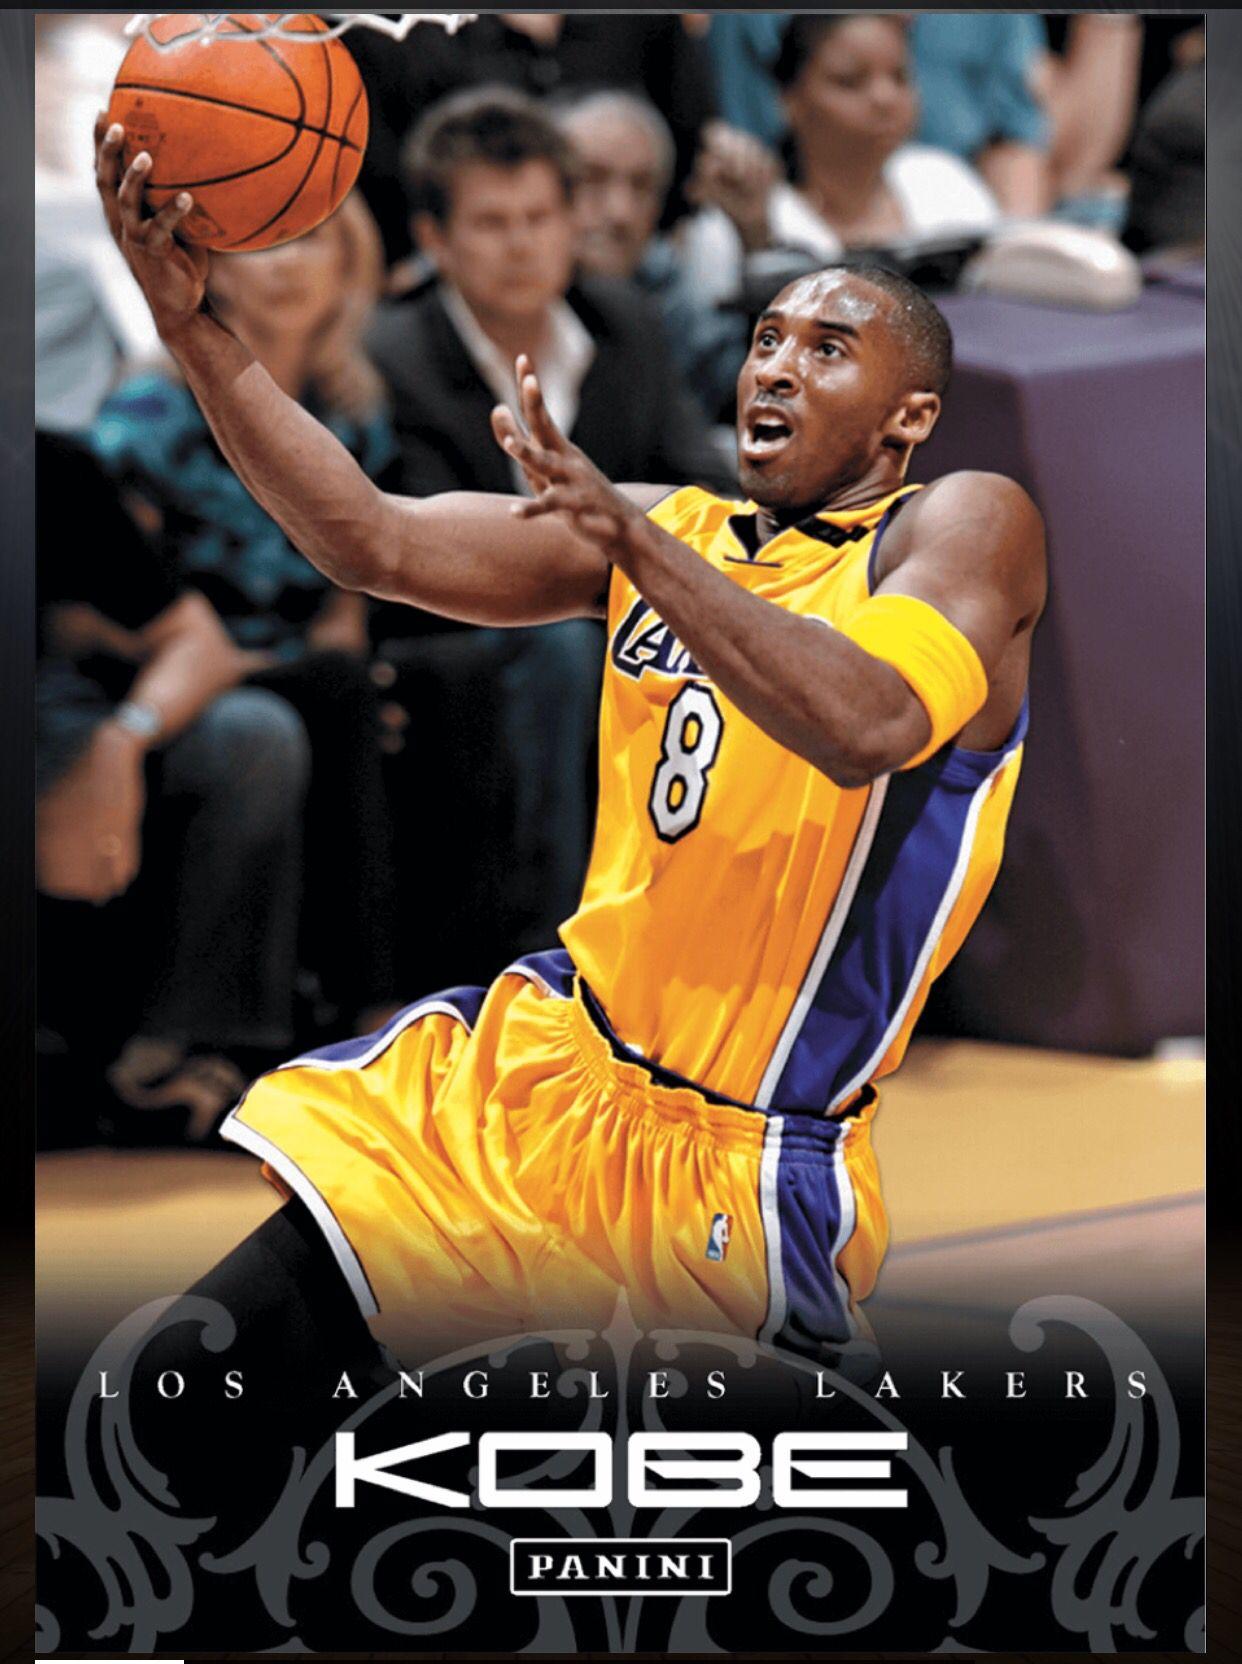 Kobe Bryant Los Angeles Lakers 78 Kobe Anthology Card 2015 2016 Panini Dunk Los Angeles Lakers Basketball Cards Lakers